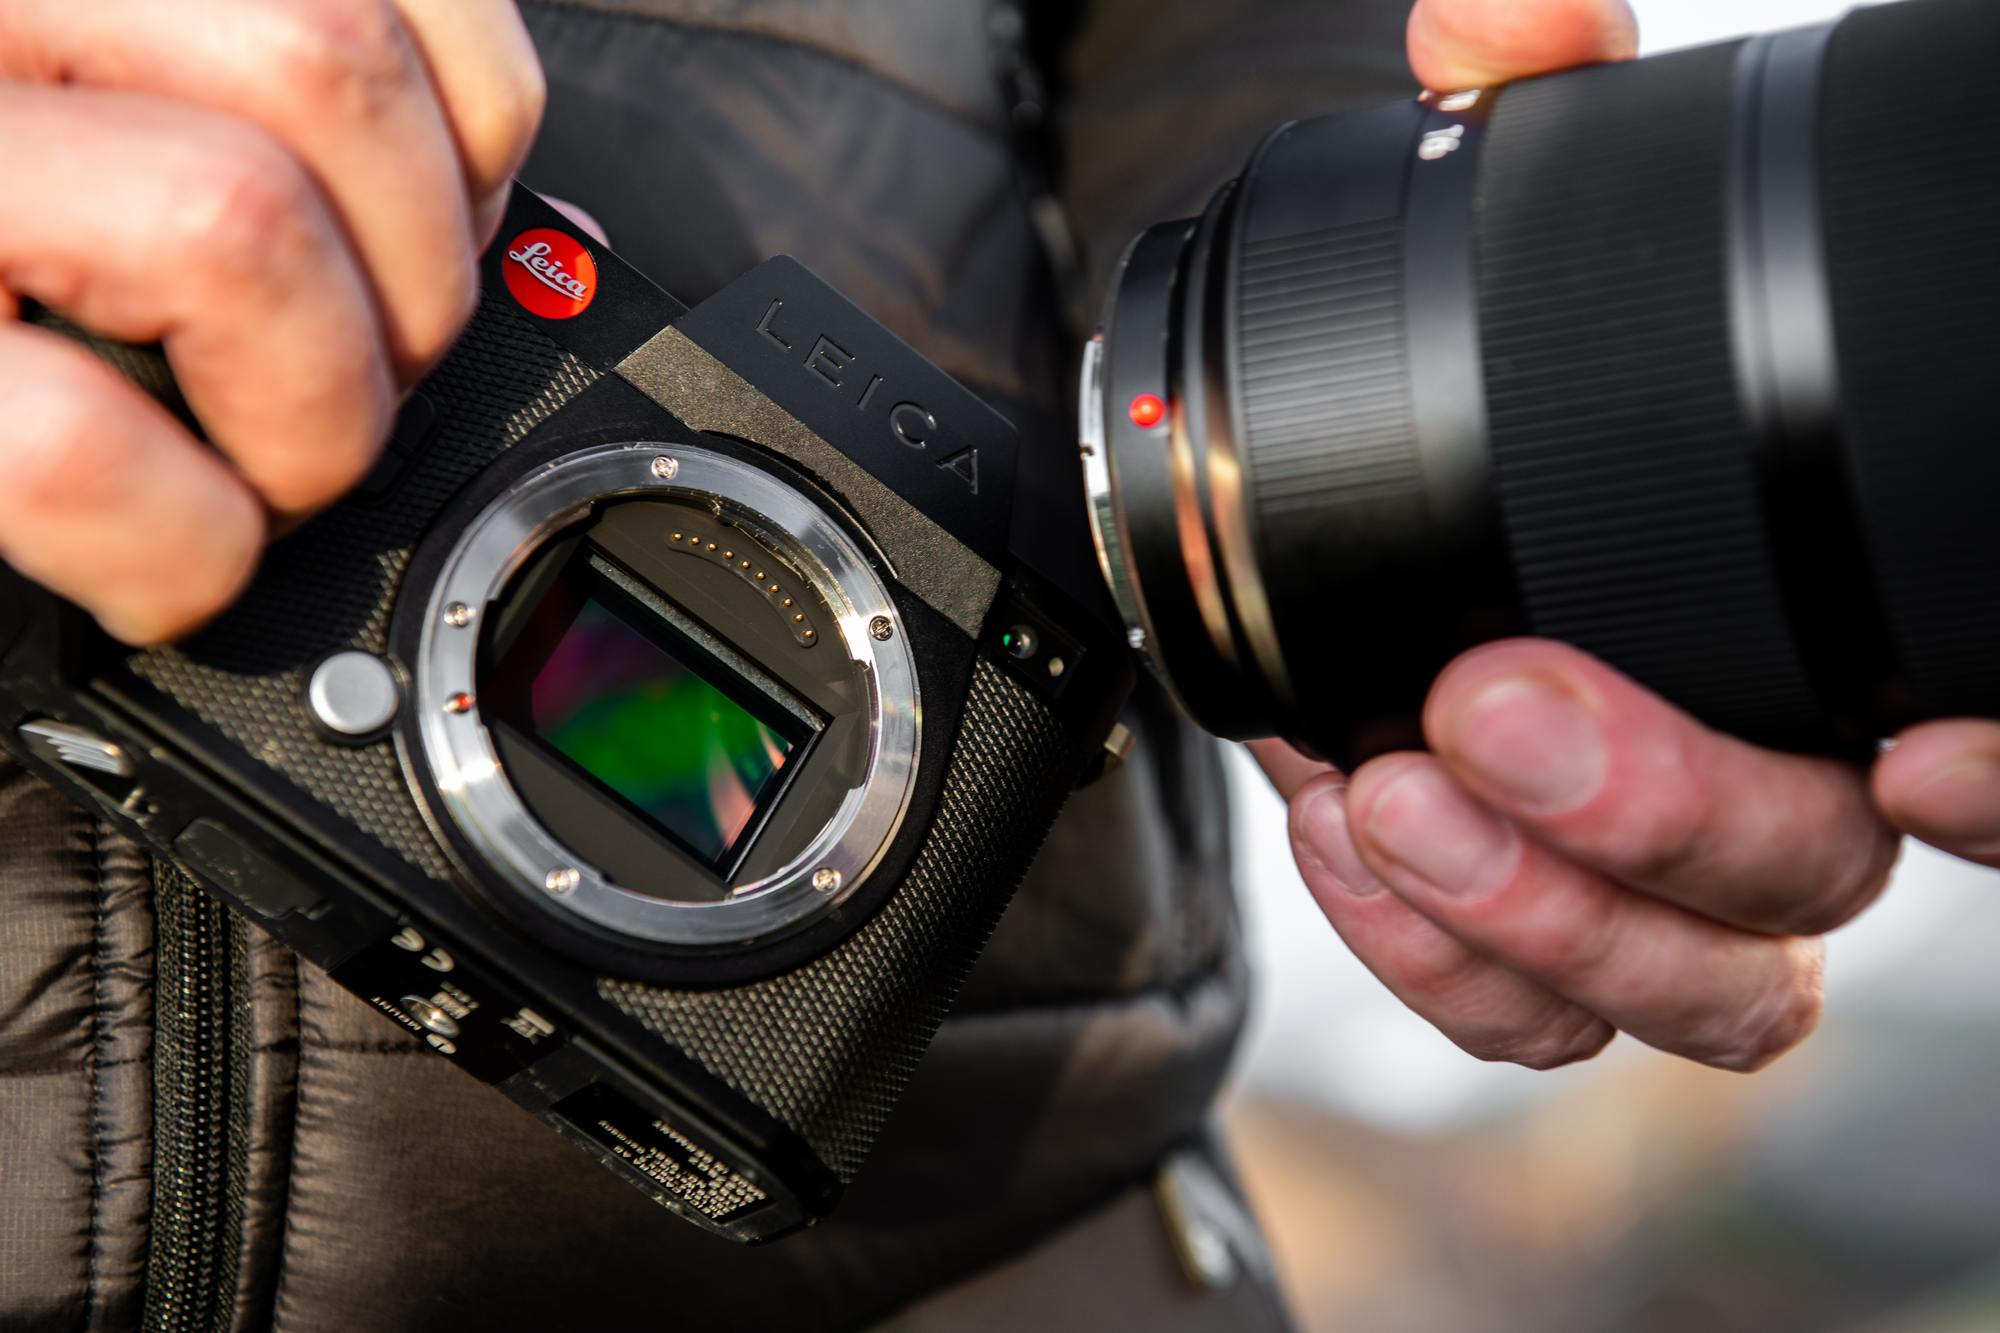 Leica's SL2-S is a hybrid full-frame camera for the upper crust